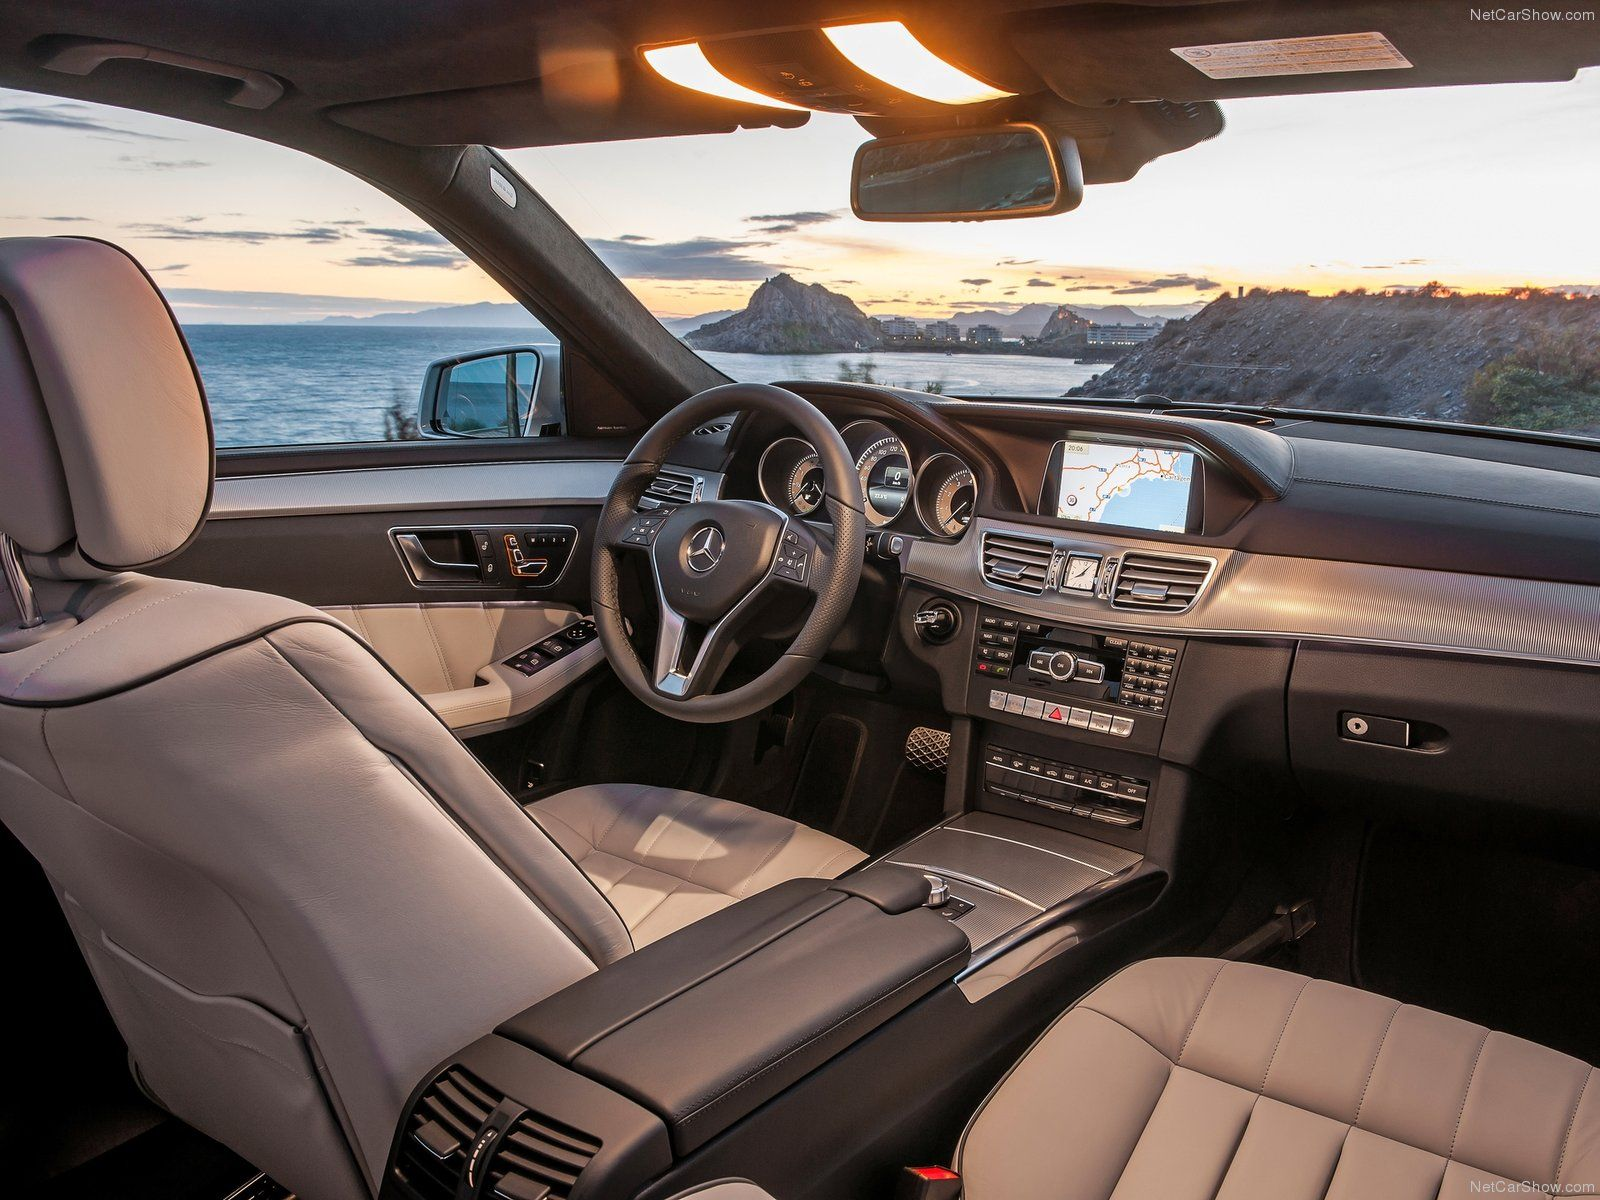 Mercedes Benz E Class 2014 Interior With Images Mercedes Benz